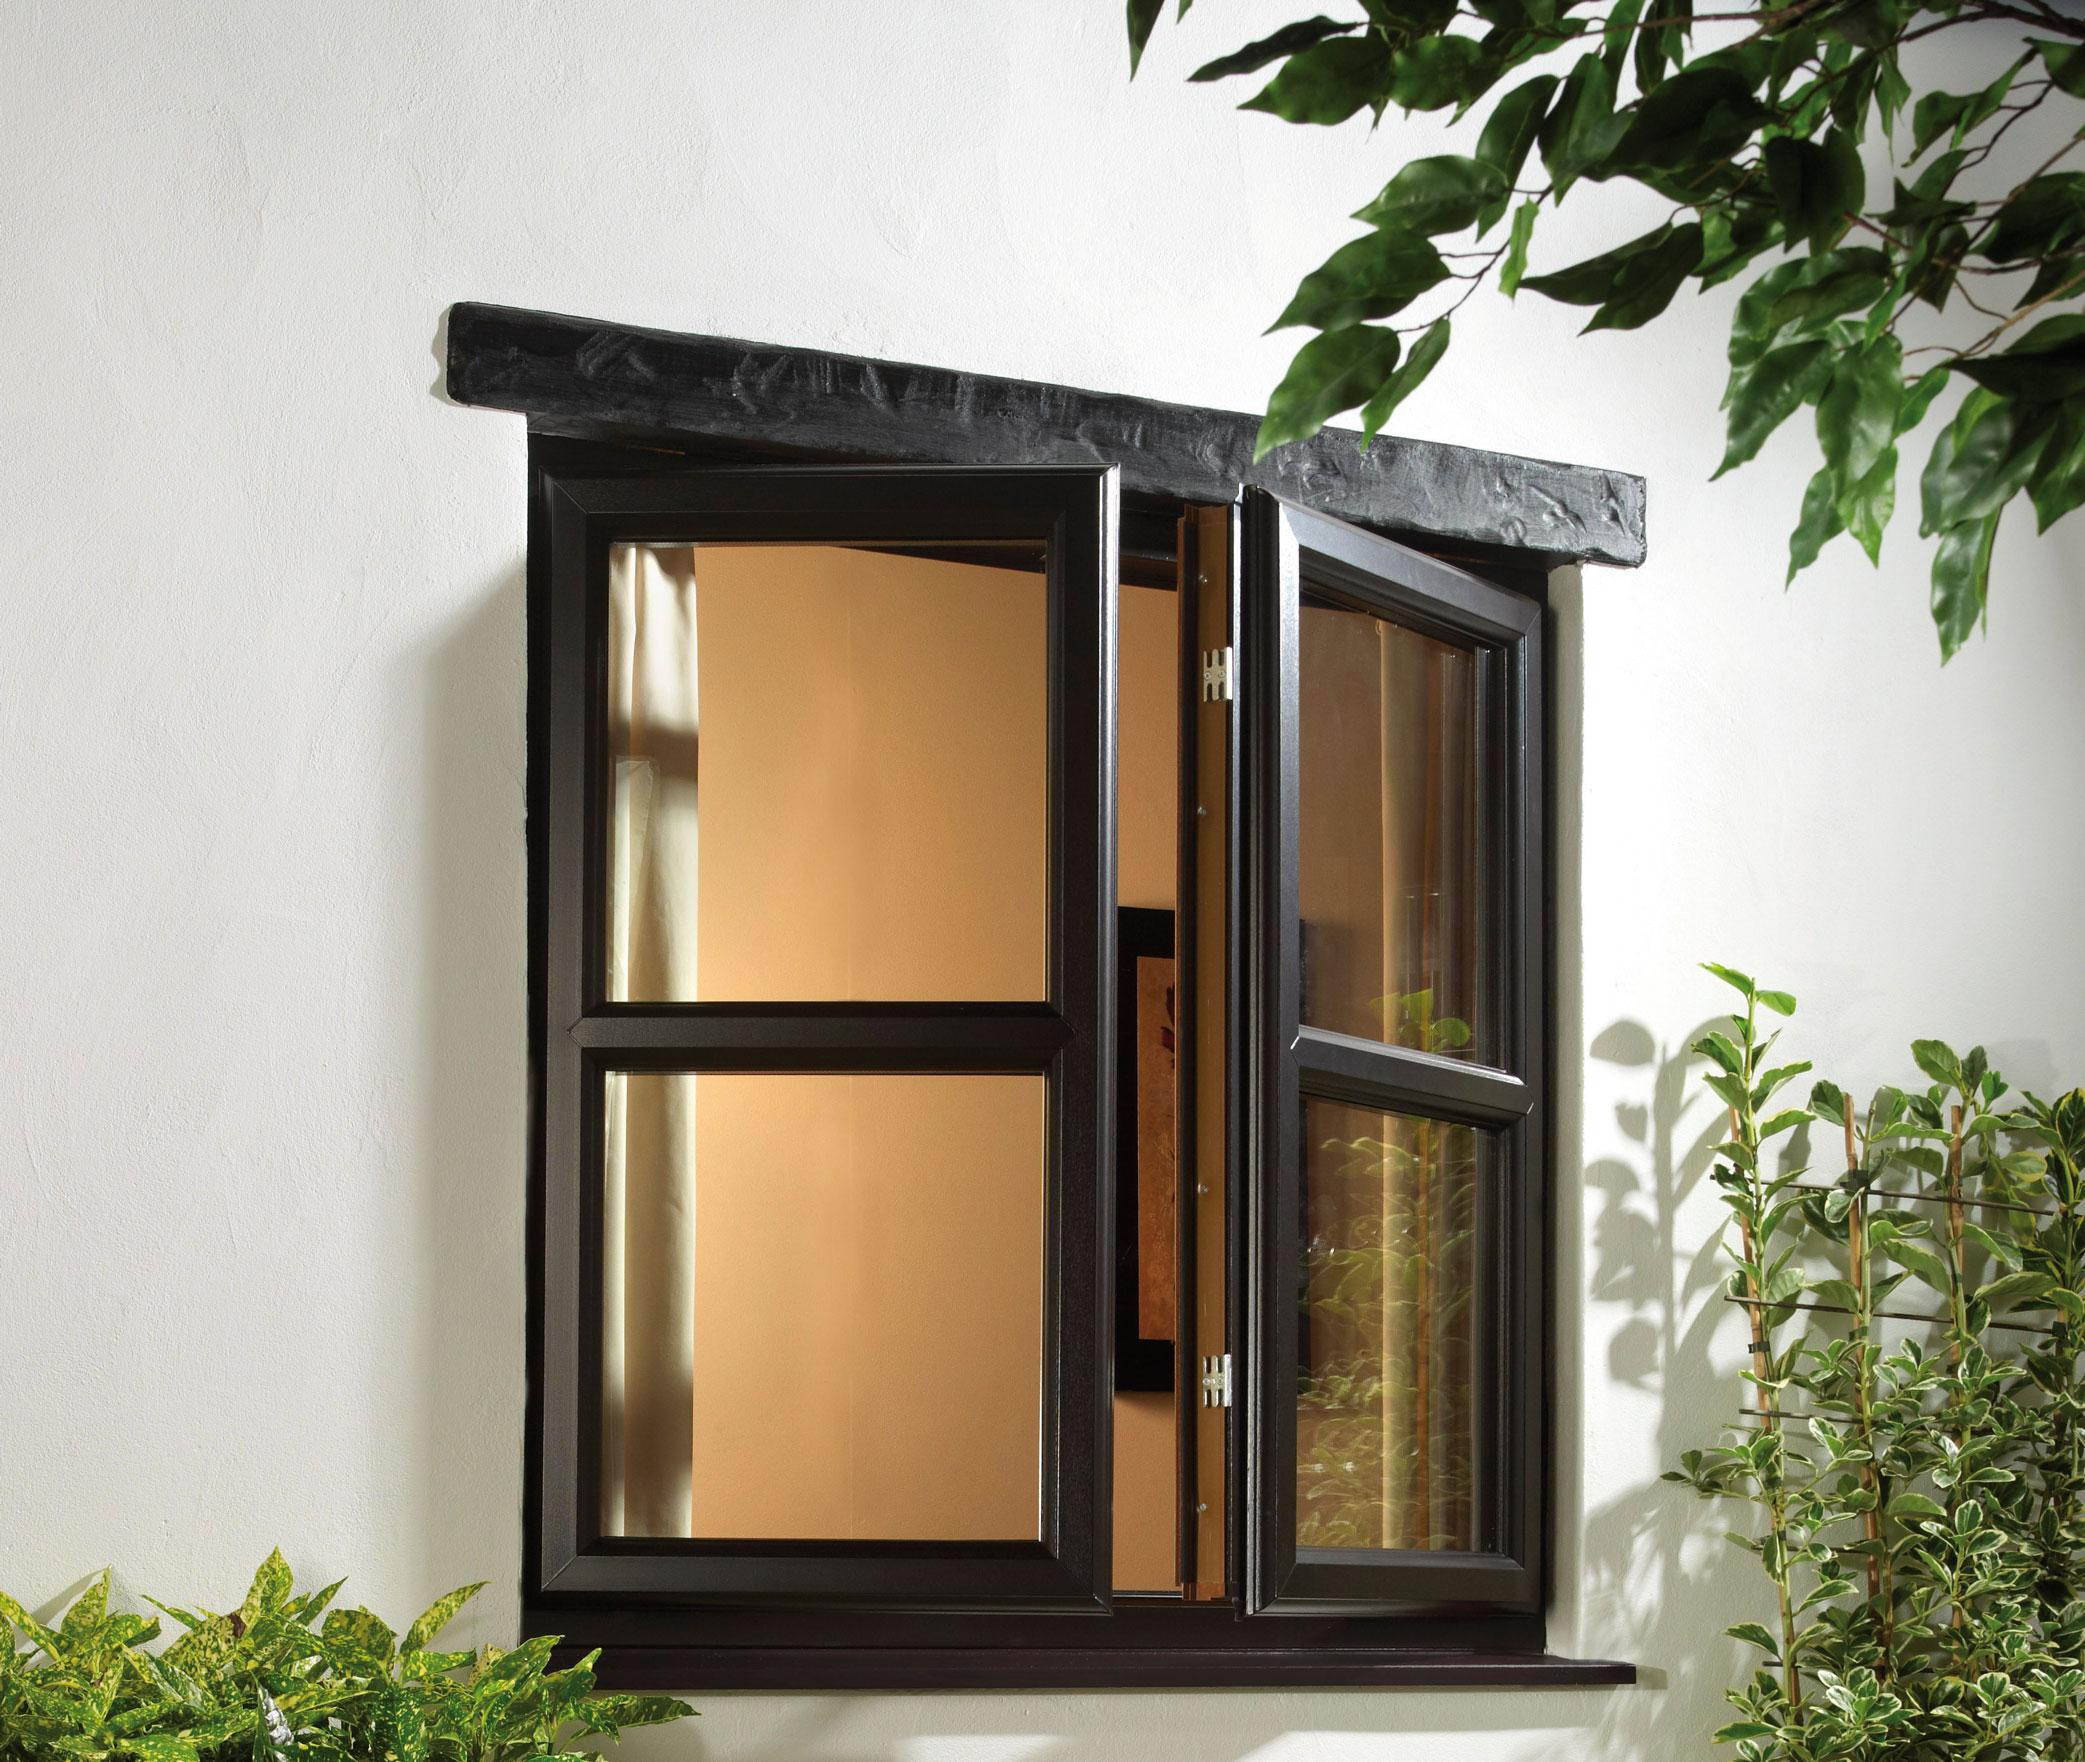 upvc windows costs stoke-on-trent